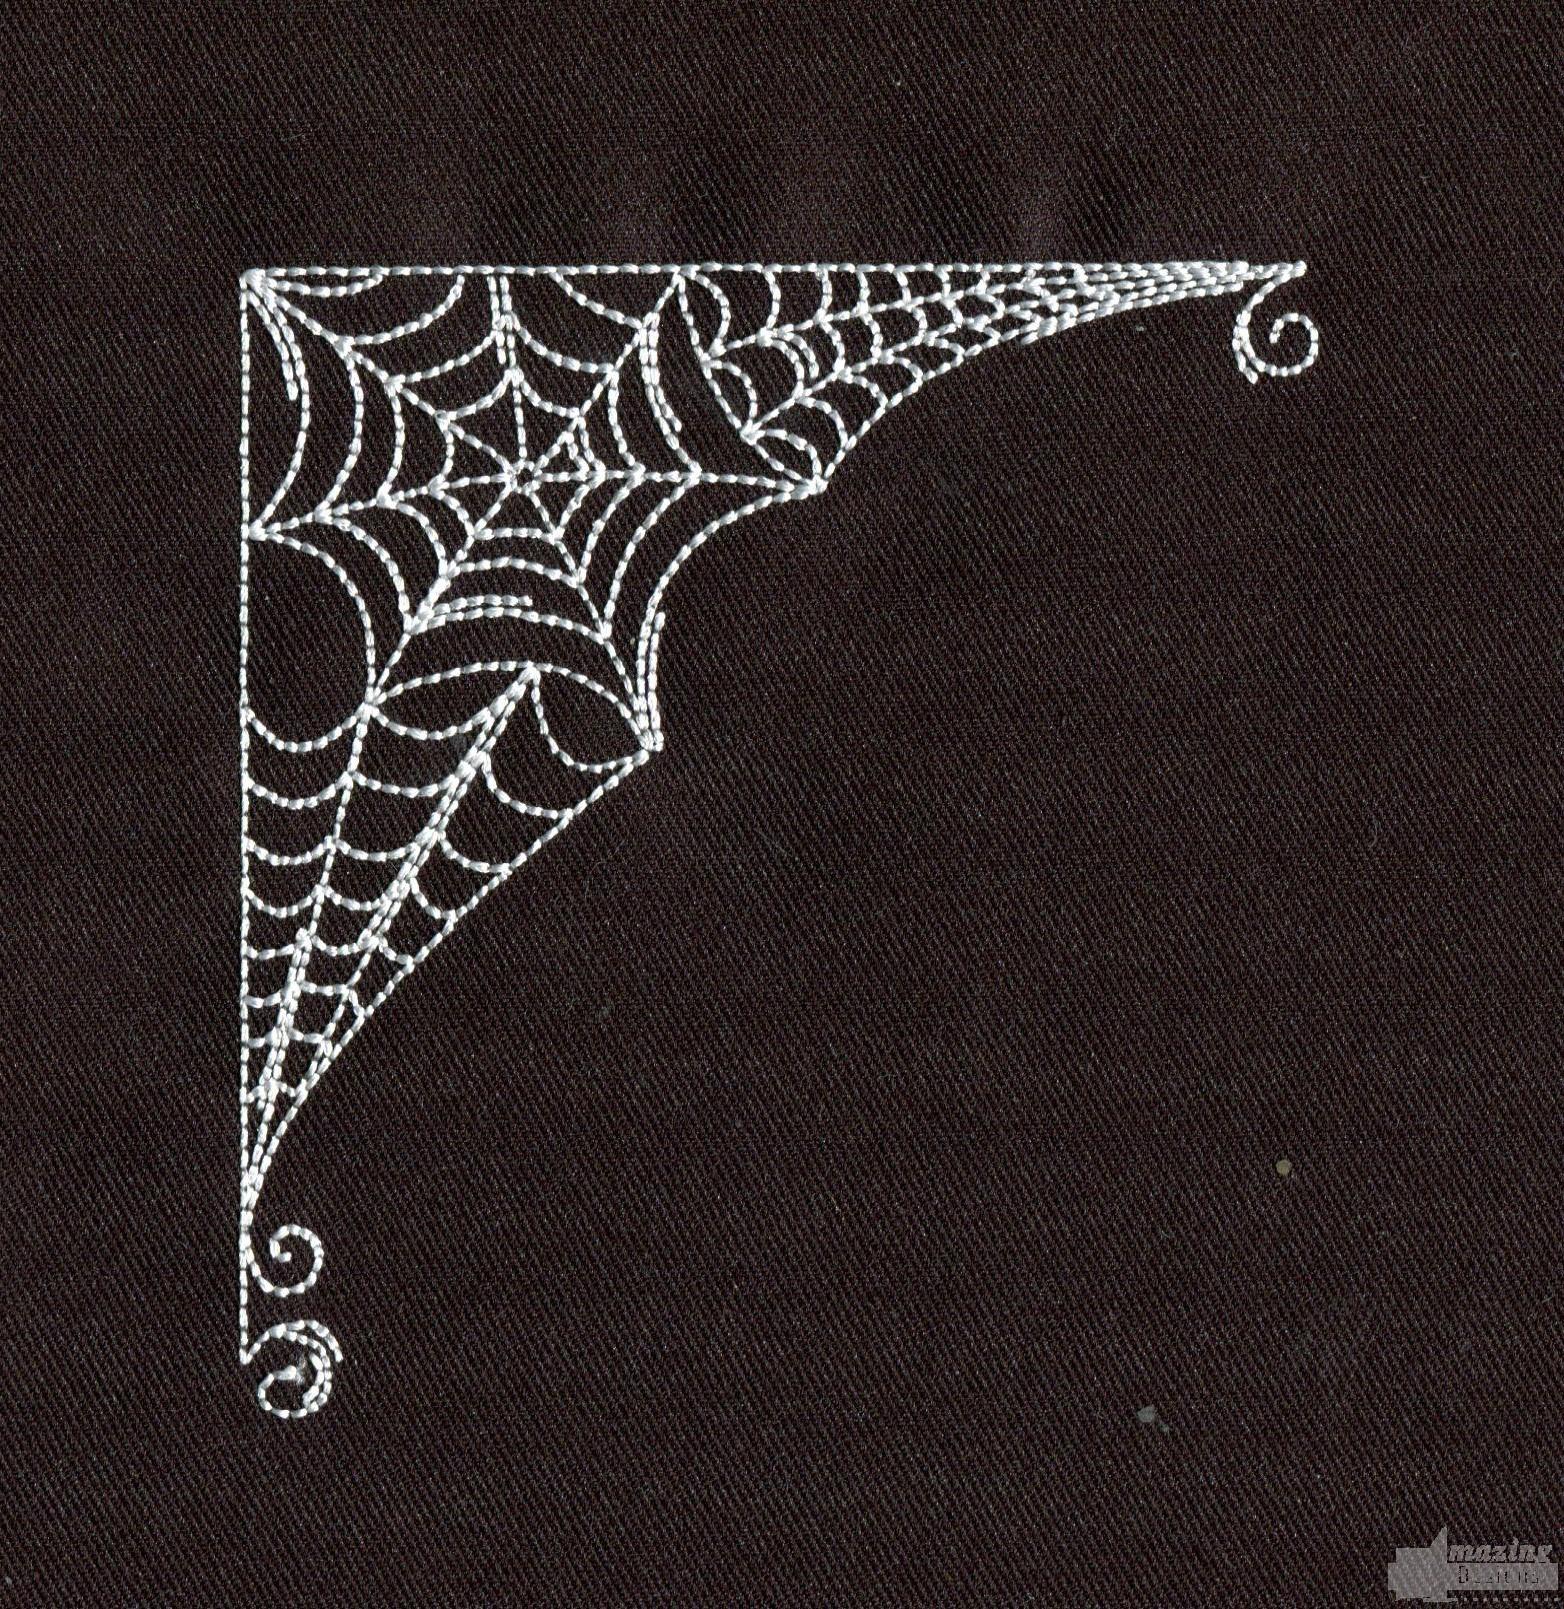 Corner spider web design - photo#7